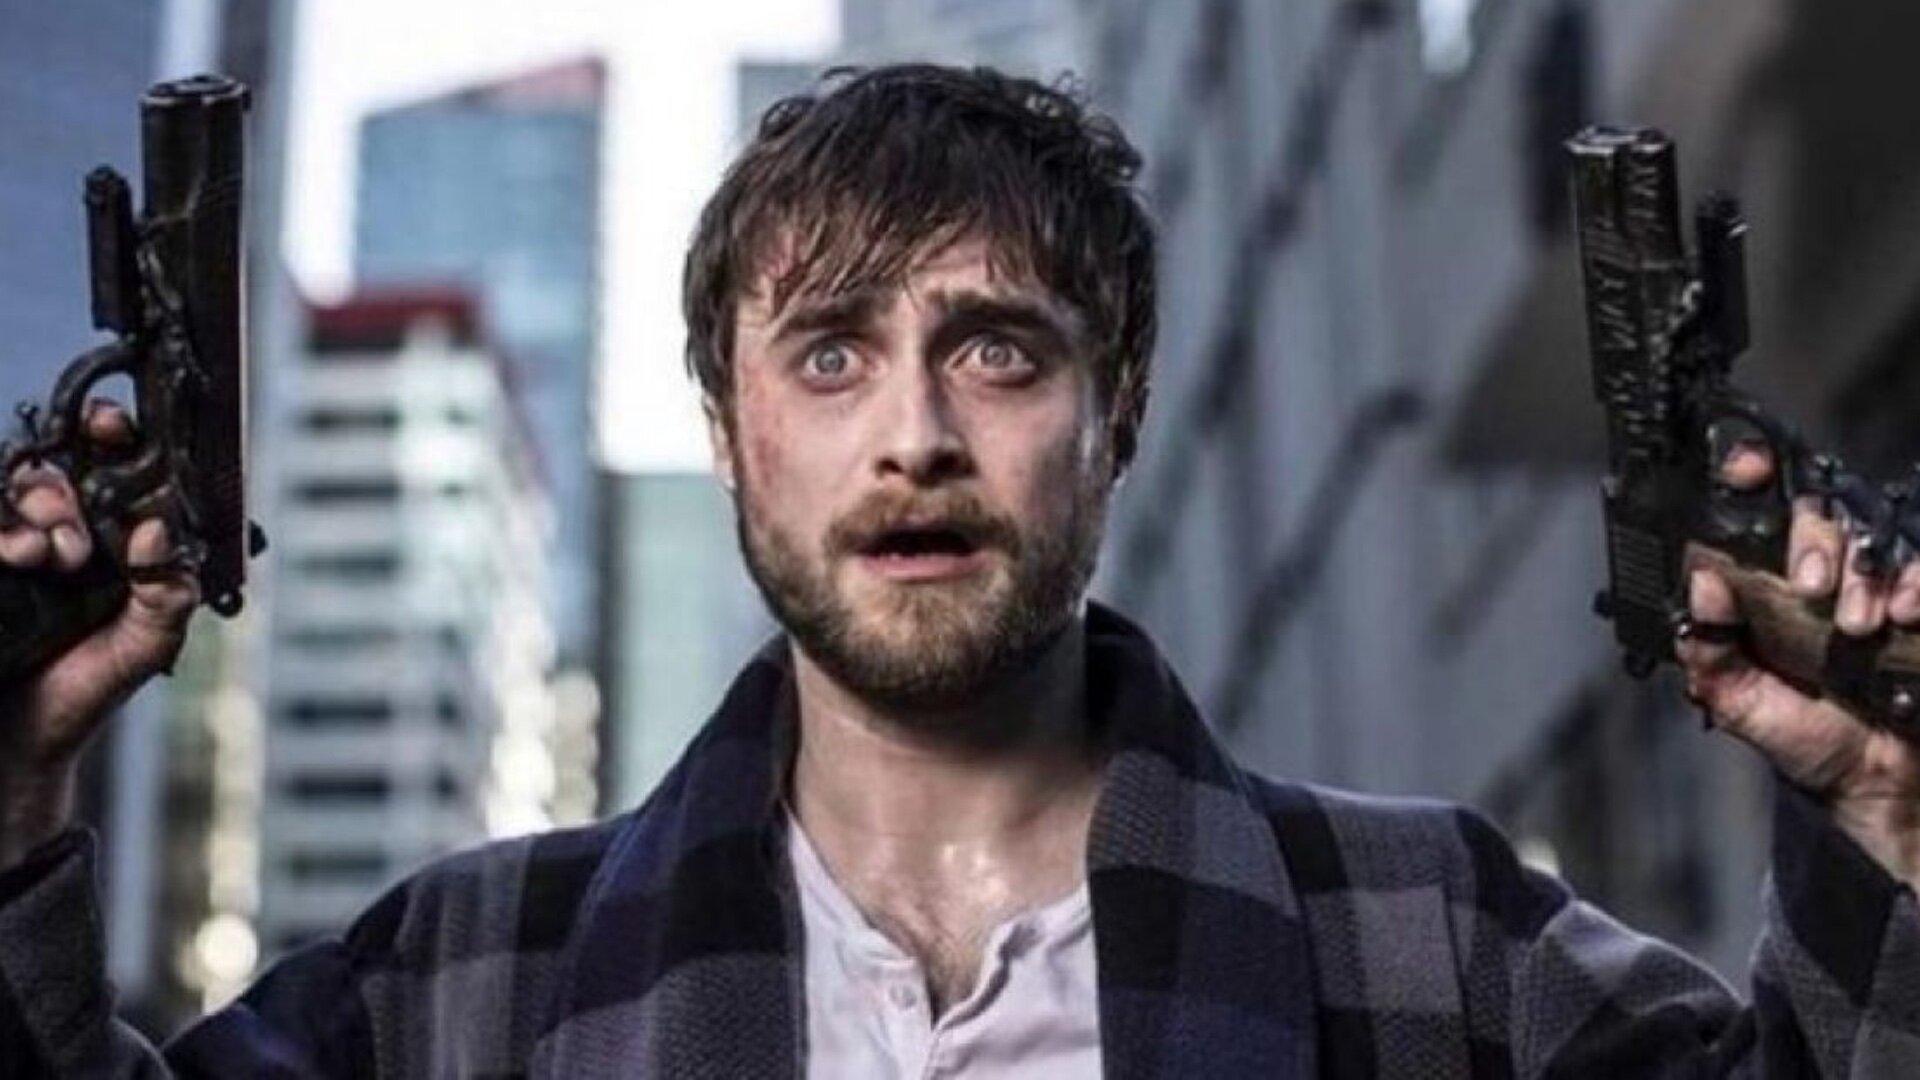 Daniel Radcliffe's Dark Comedy Sci-Fi Thriller GUNS AKIMBO Picked Up by Saban Films